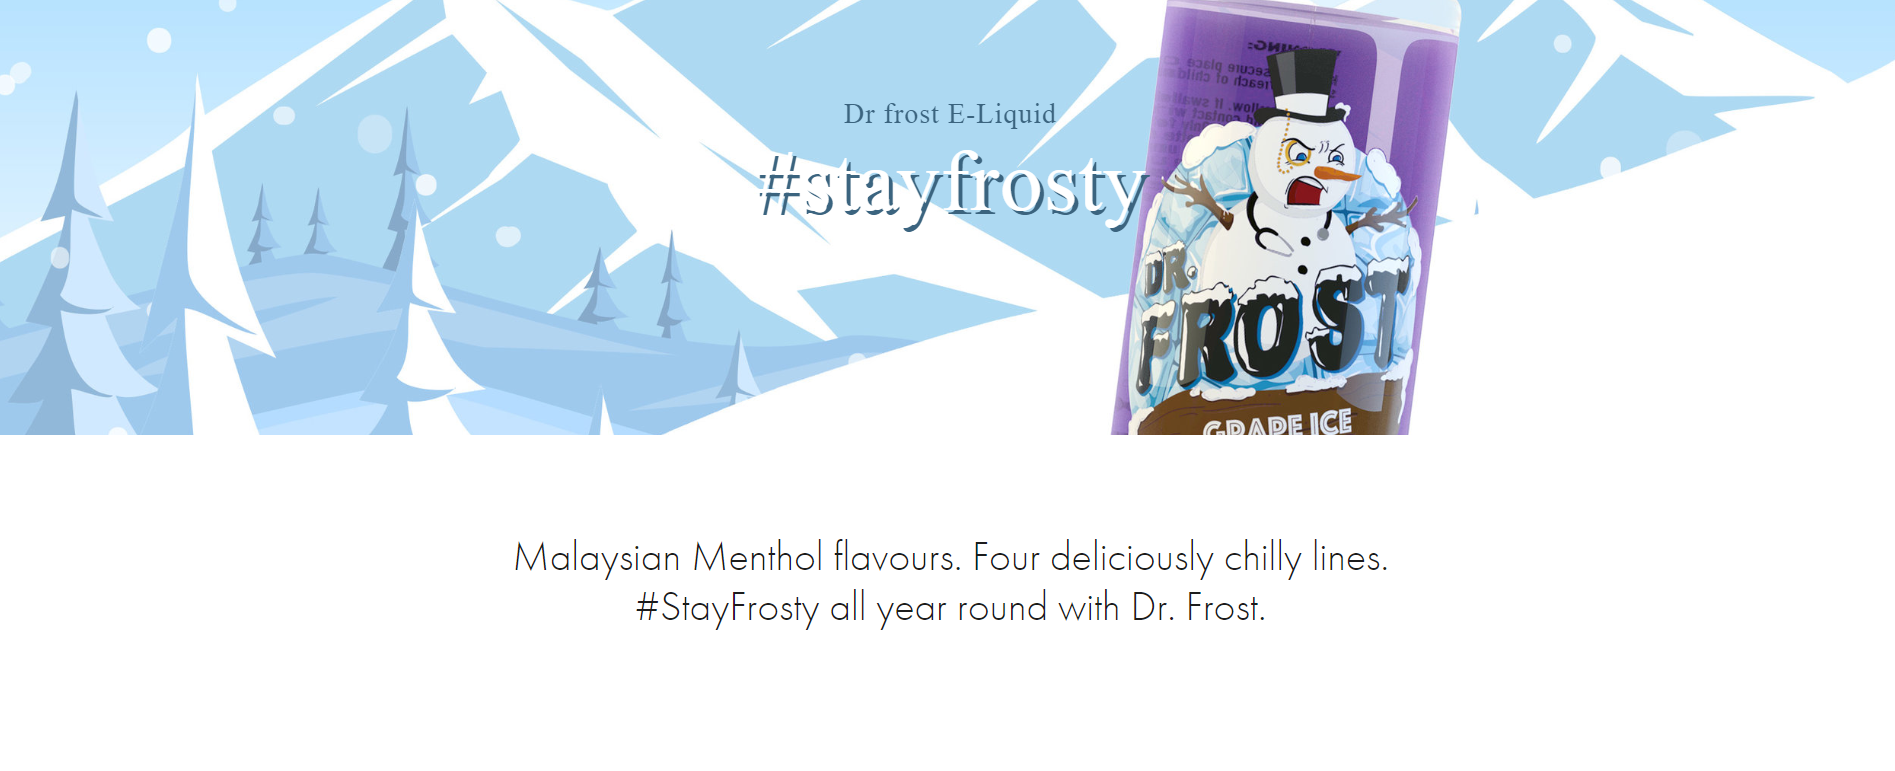 Dr Frost eliquid kopen, Dr Frost eliquid kopen Belgie, Dr Frost eliquid kopen Nederland